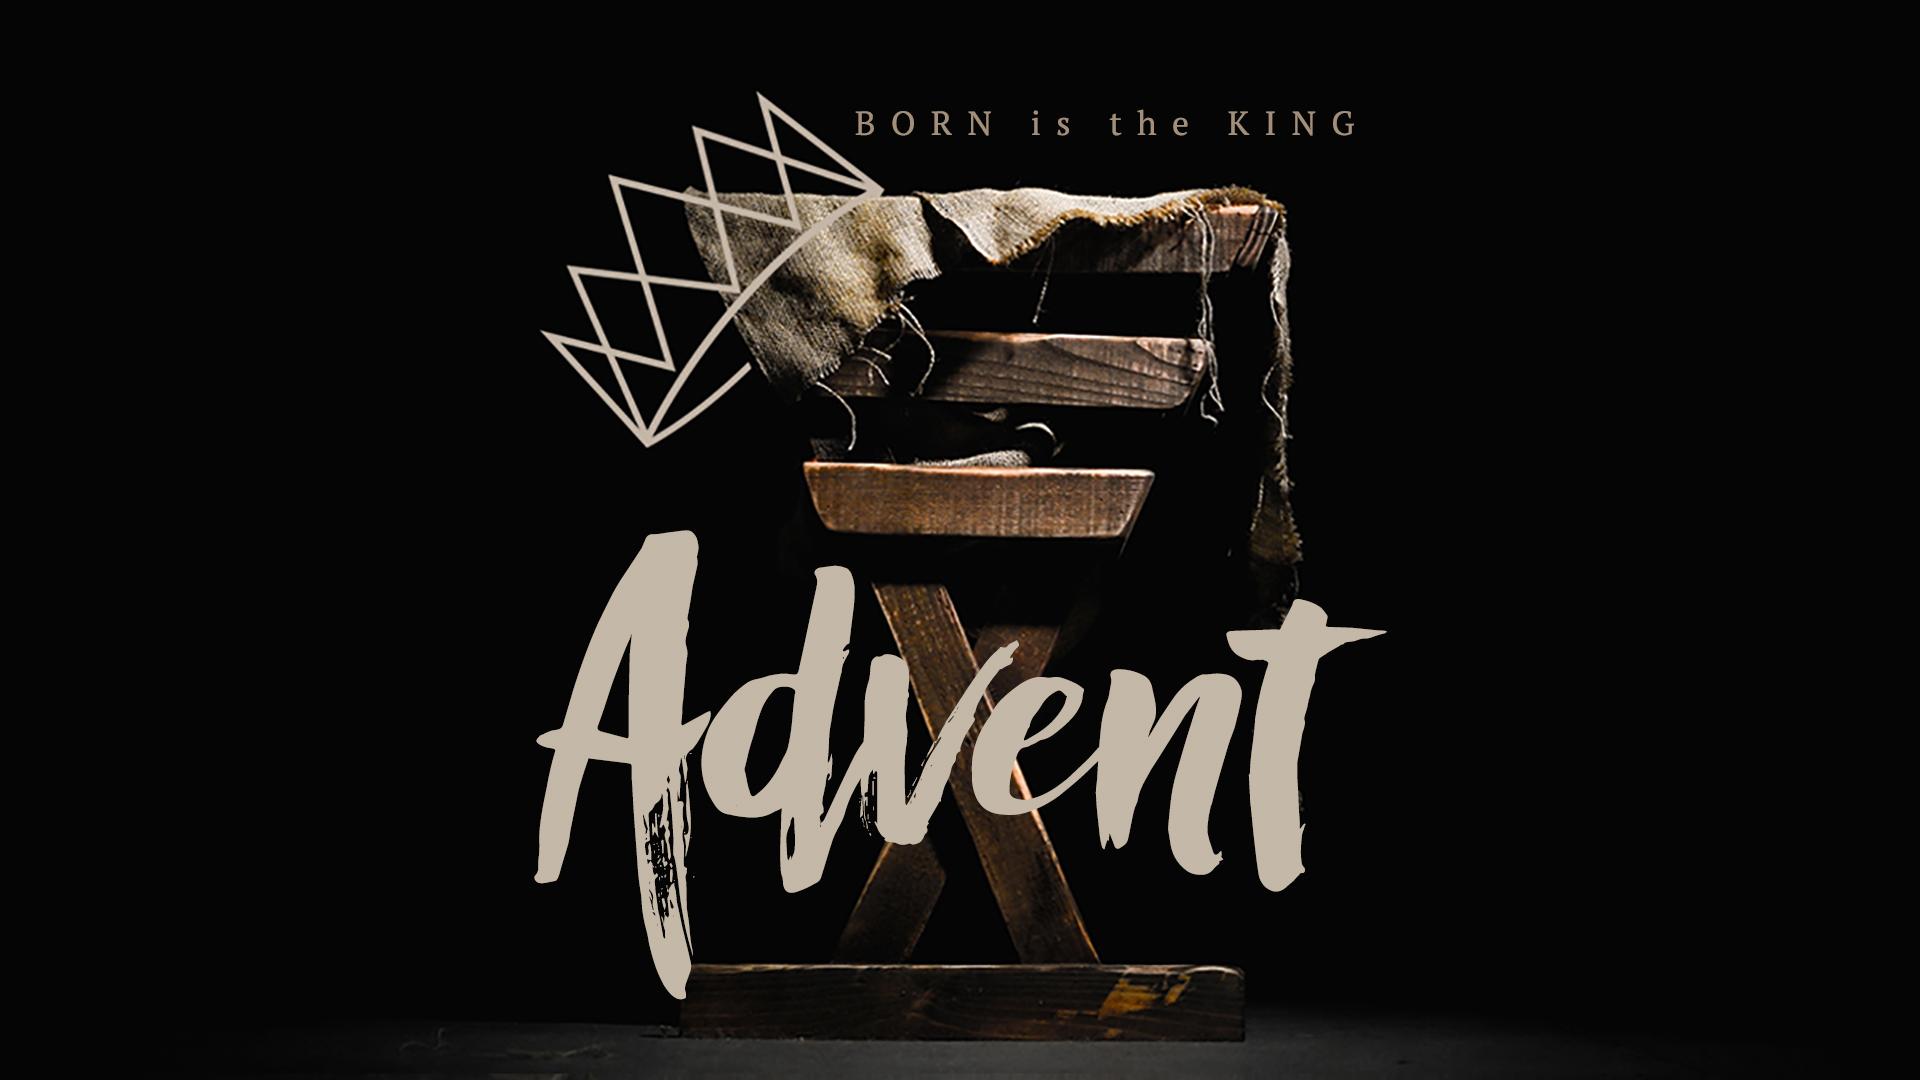 Advent-2017-Title.jpg